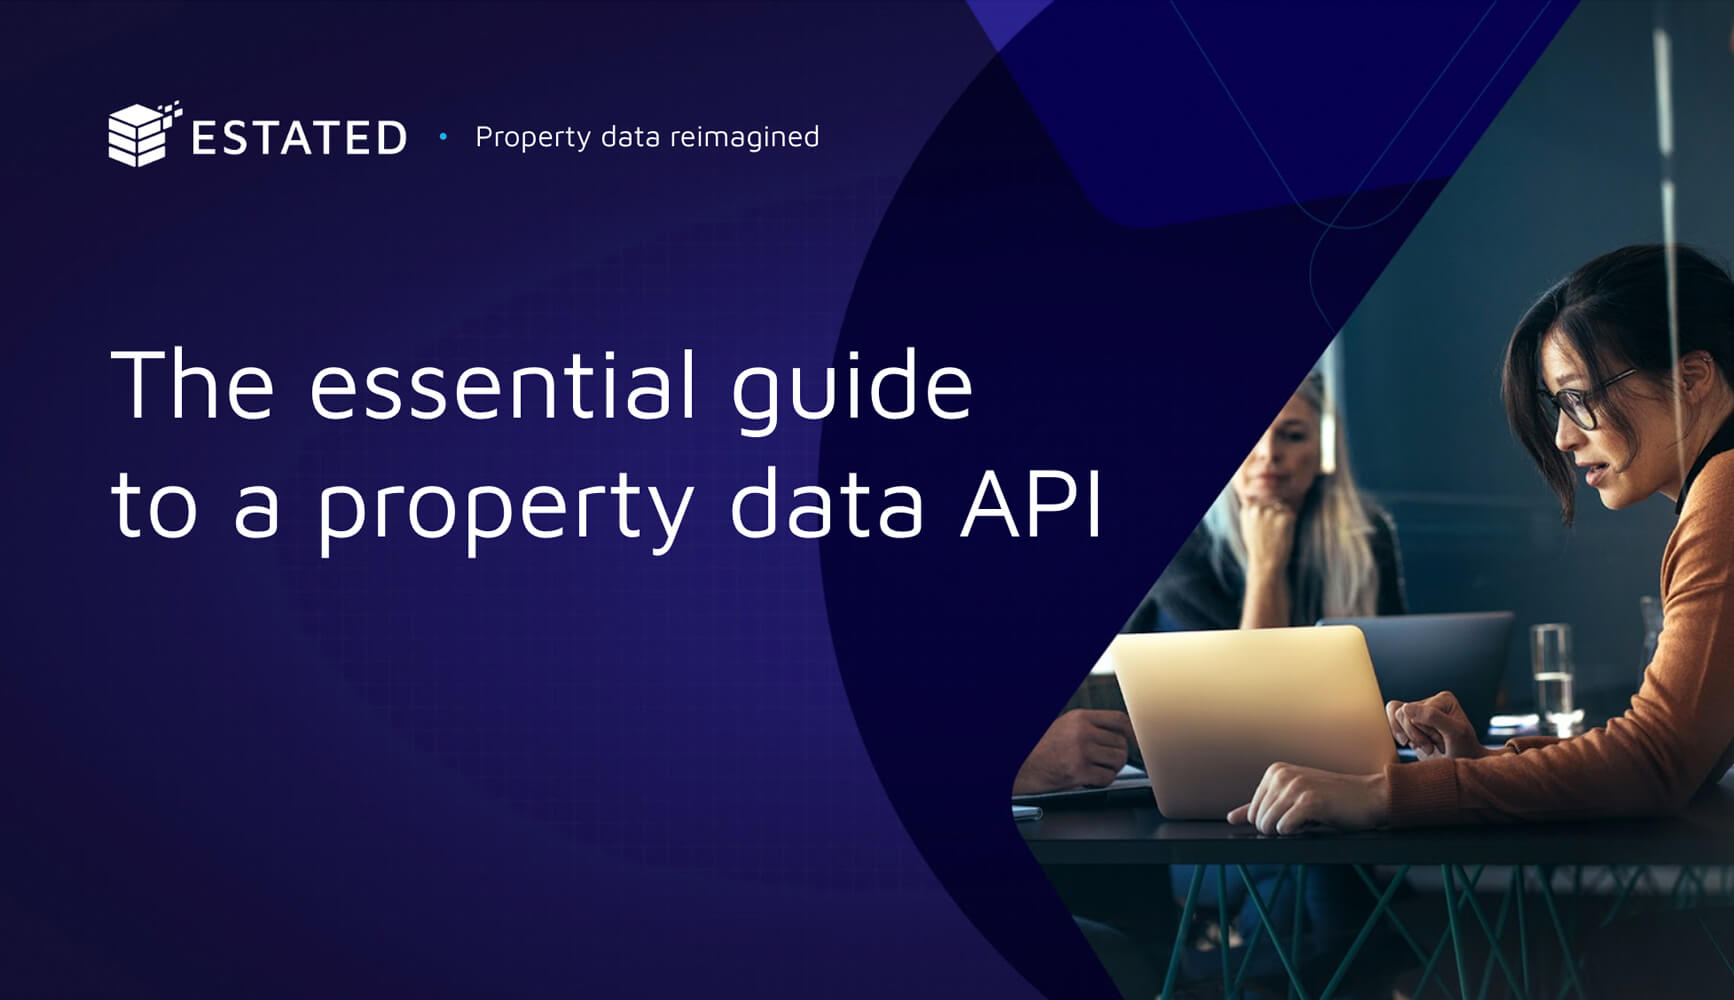 The essential guide to a property data API